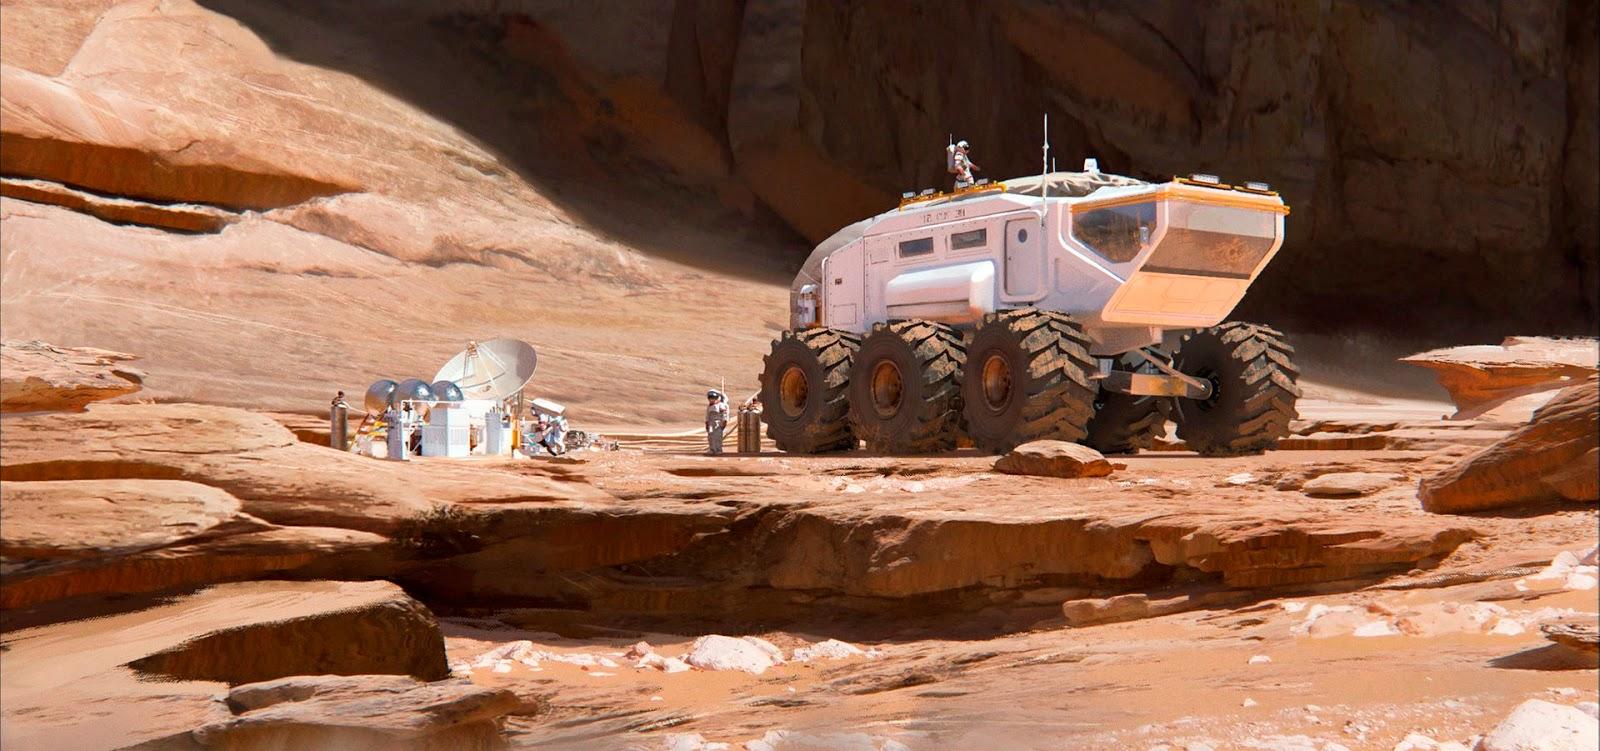 Mars rover by Florent Lebrun